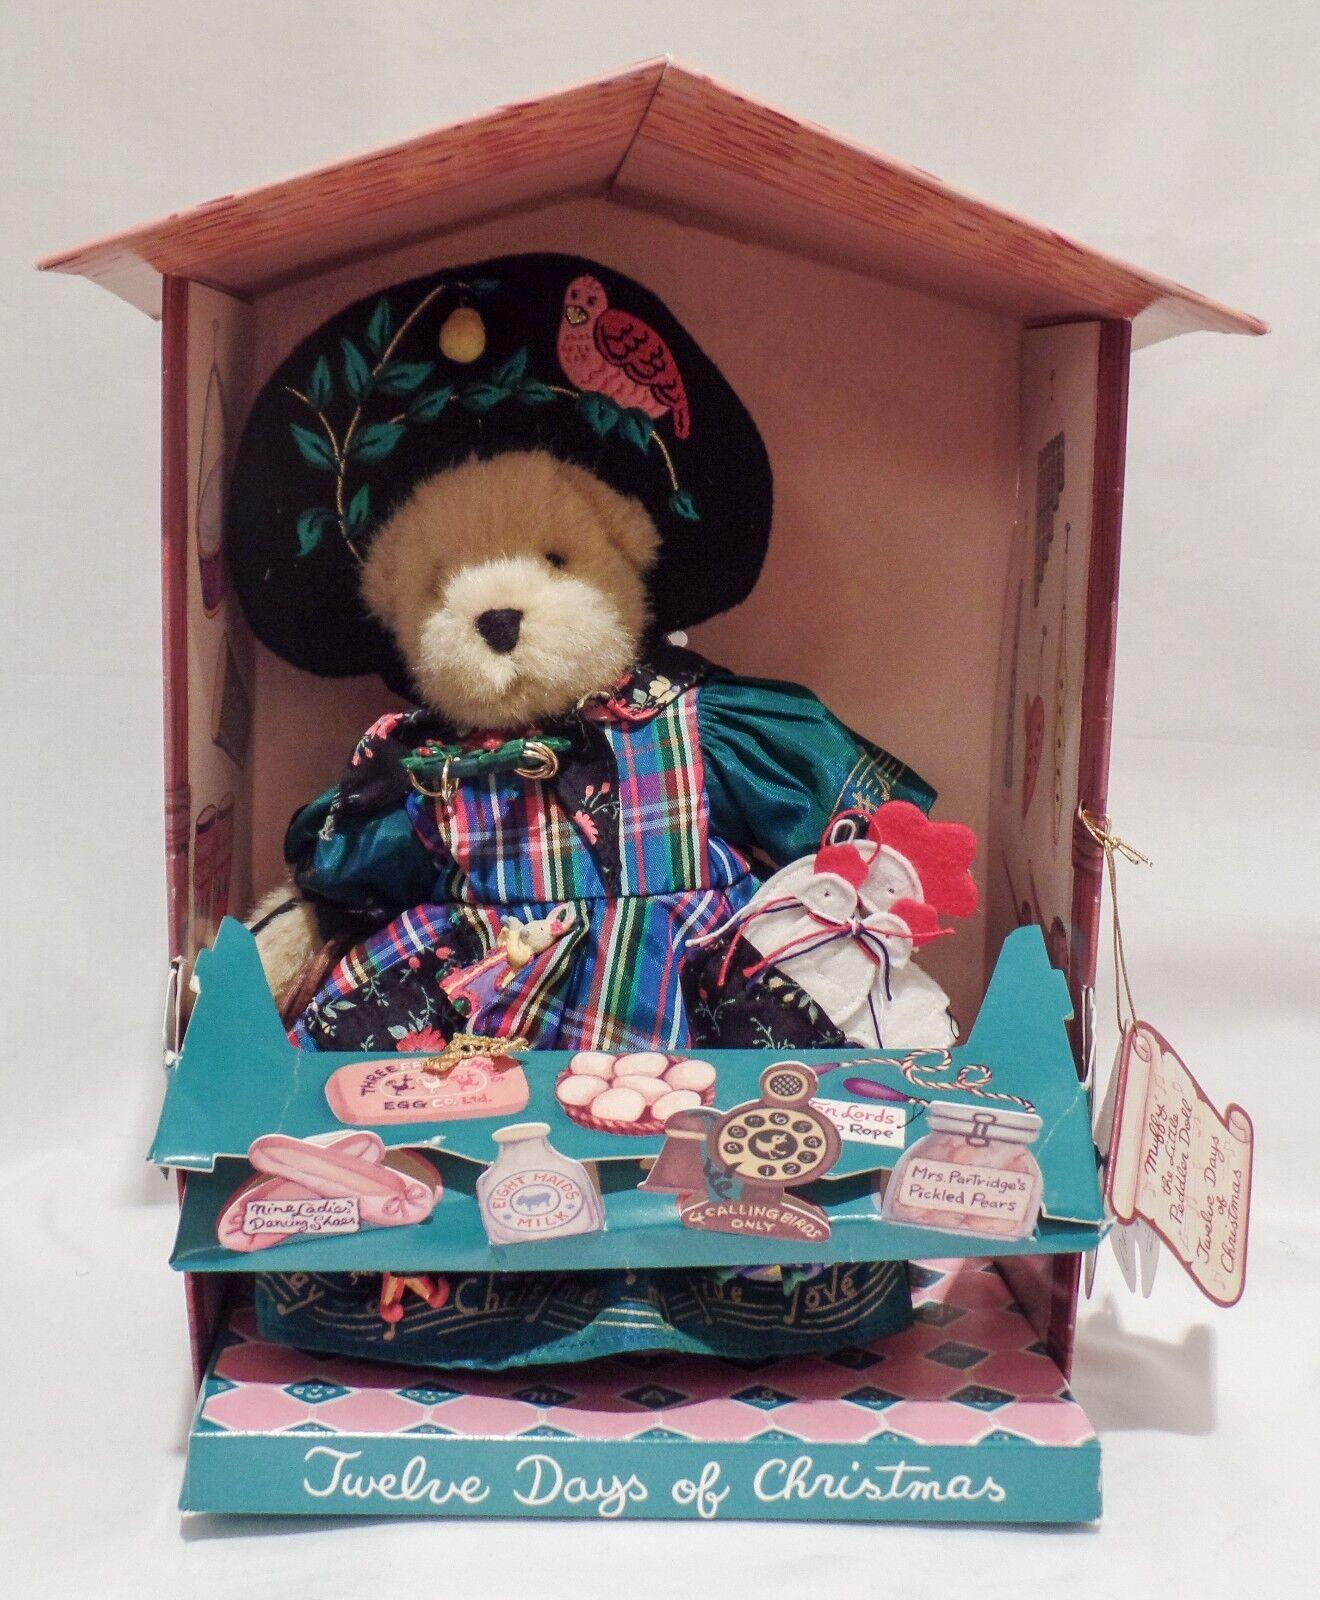 Muffy VanderBear  12 Days of Christmas  Little Peddler 1997 - NIB - Signed  3982